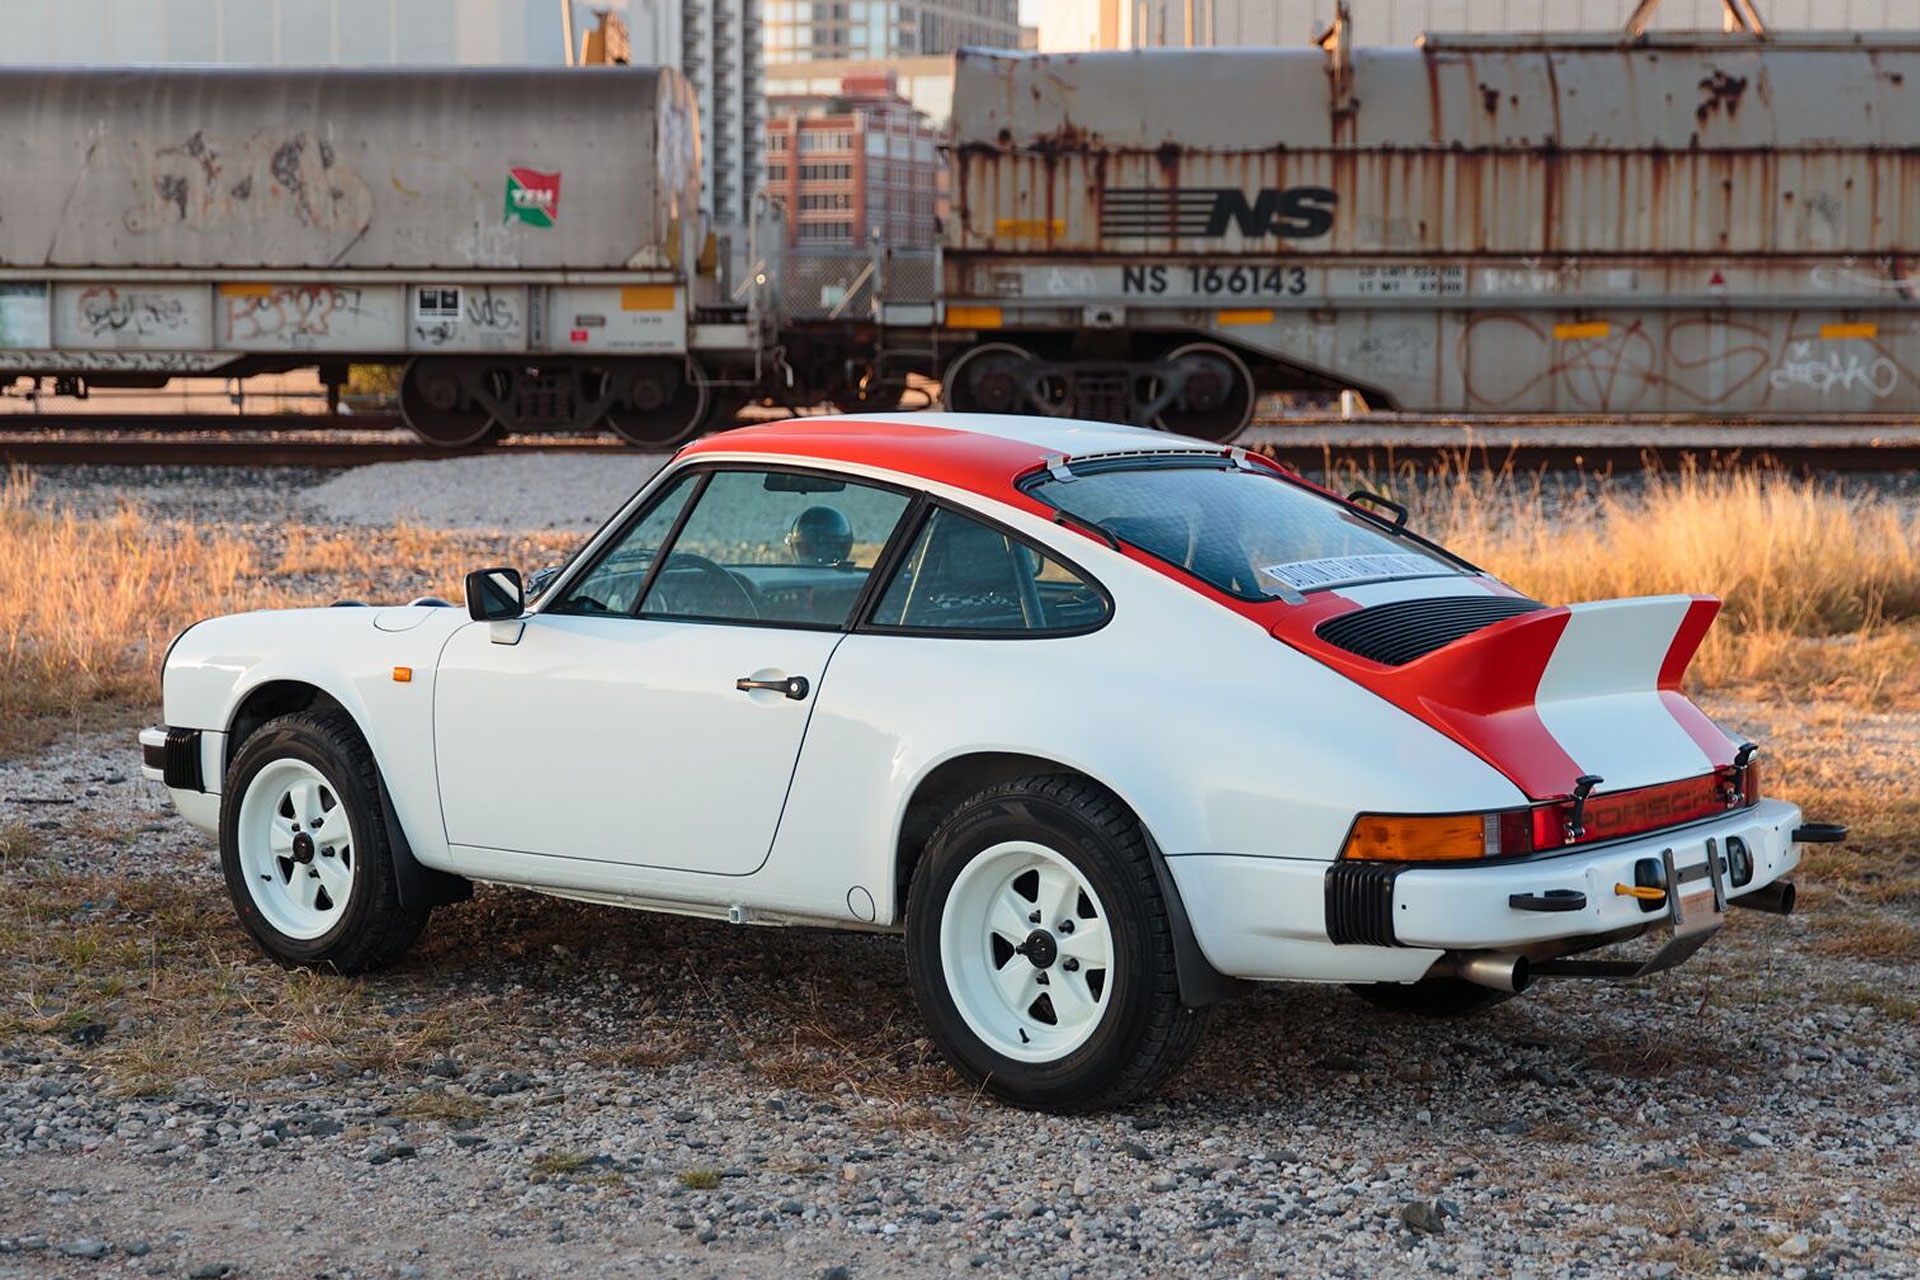 Porsche 911 Safari 4 Bons Rapazes